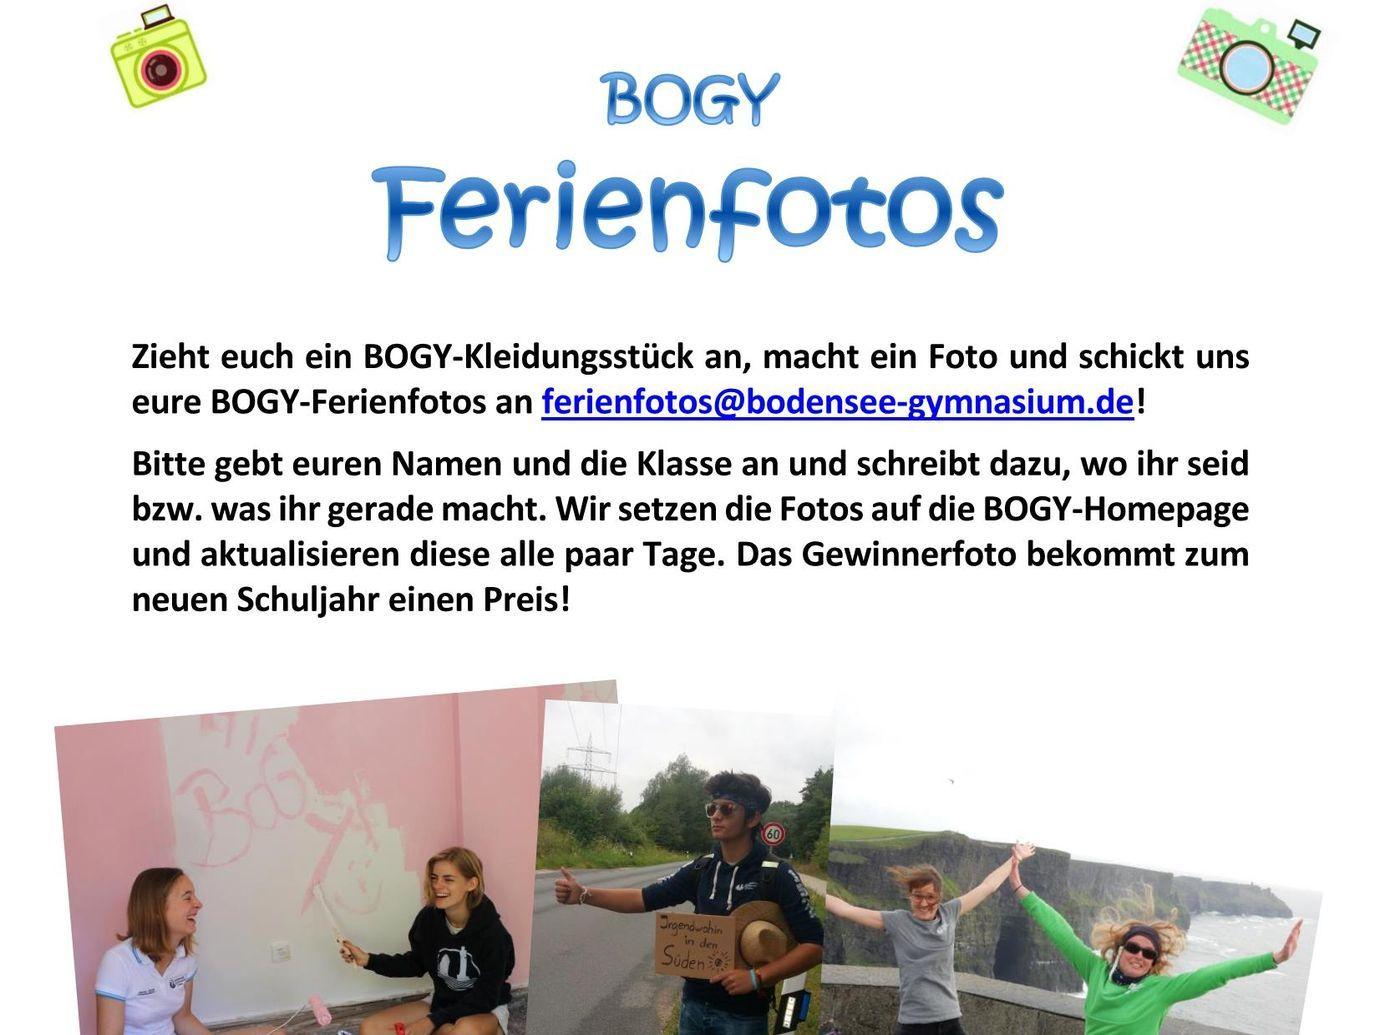 BOGY-Ferienfotos